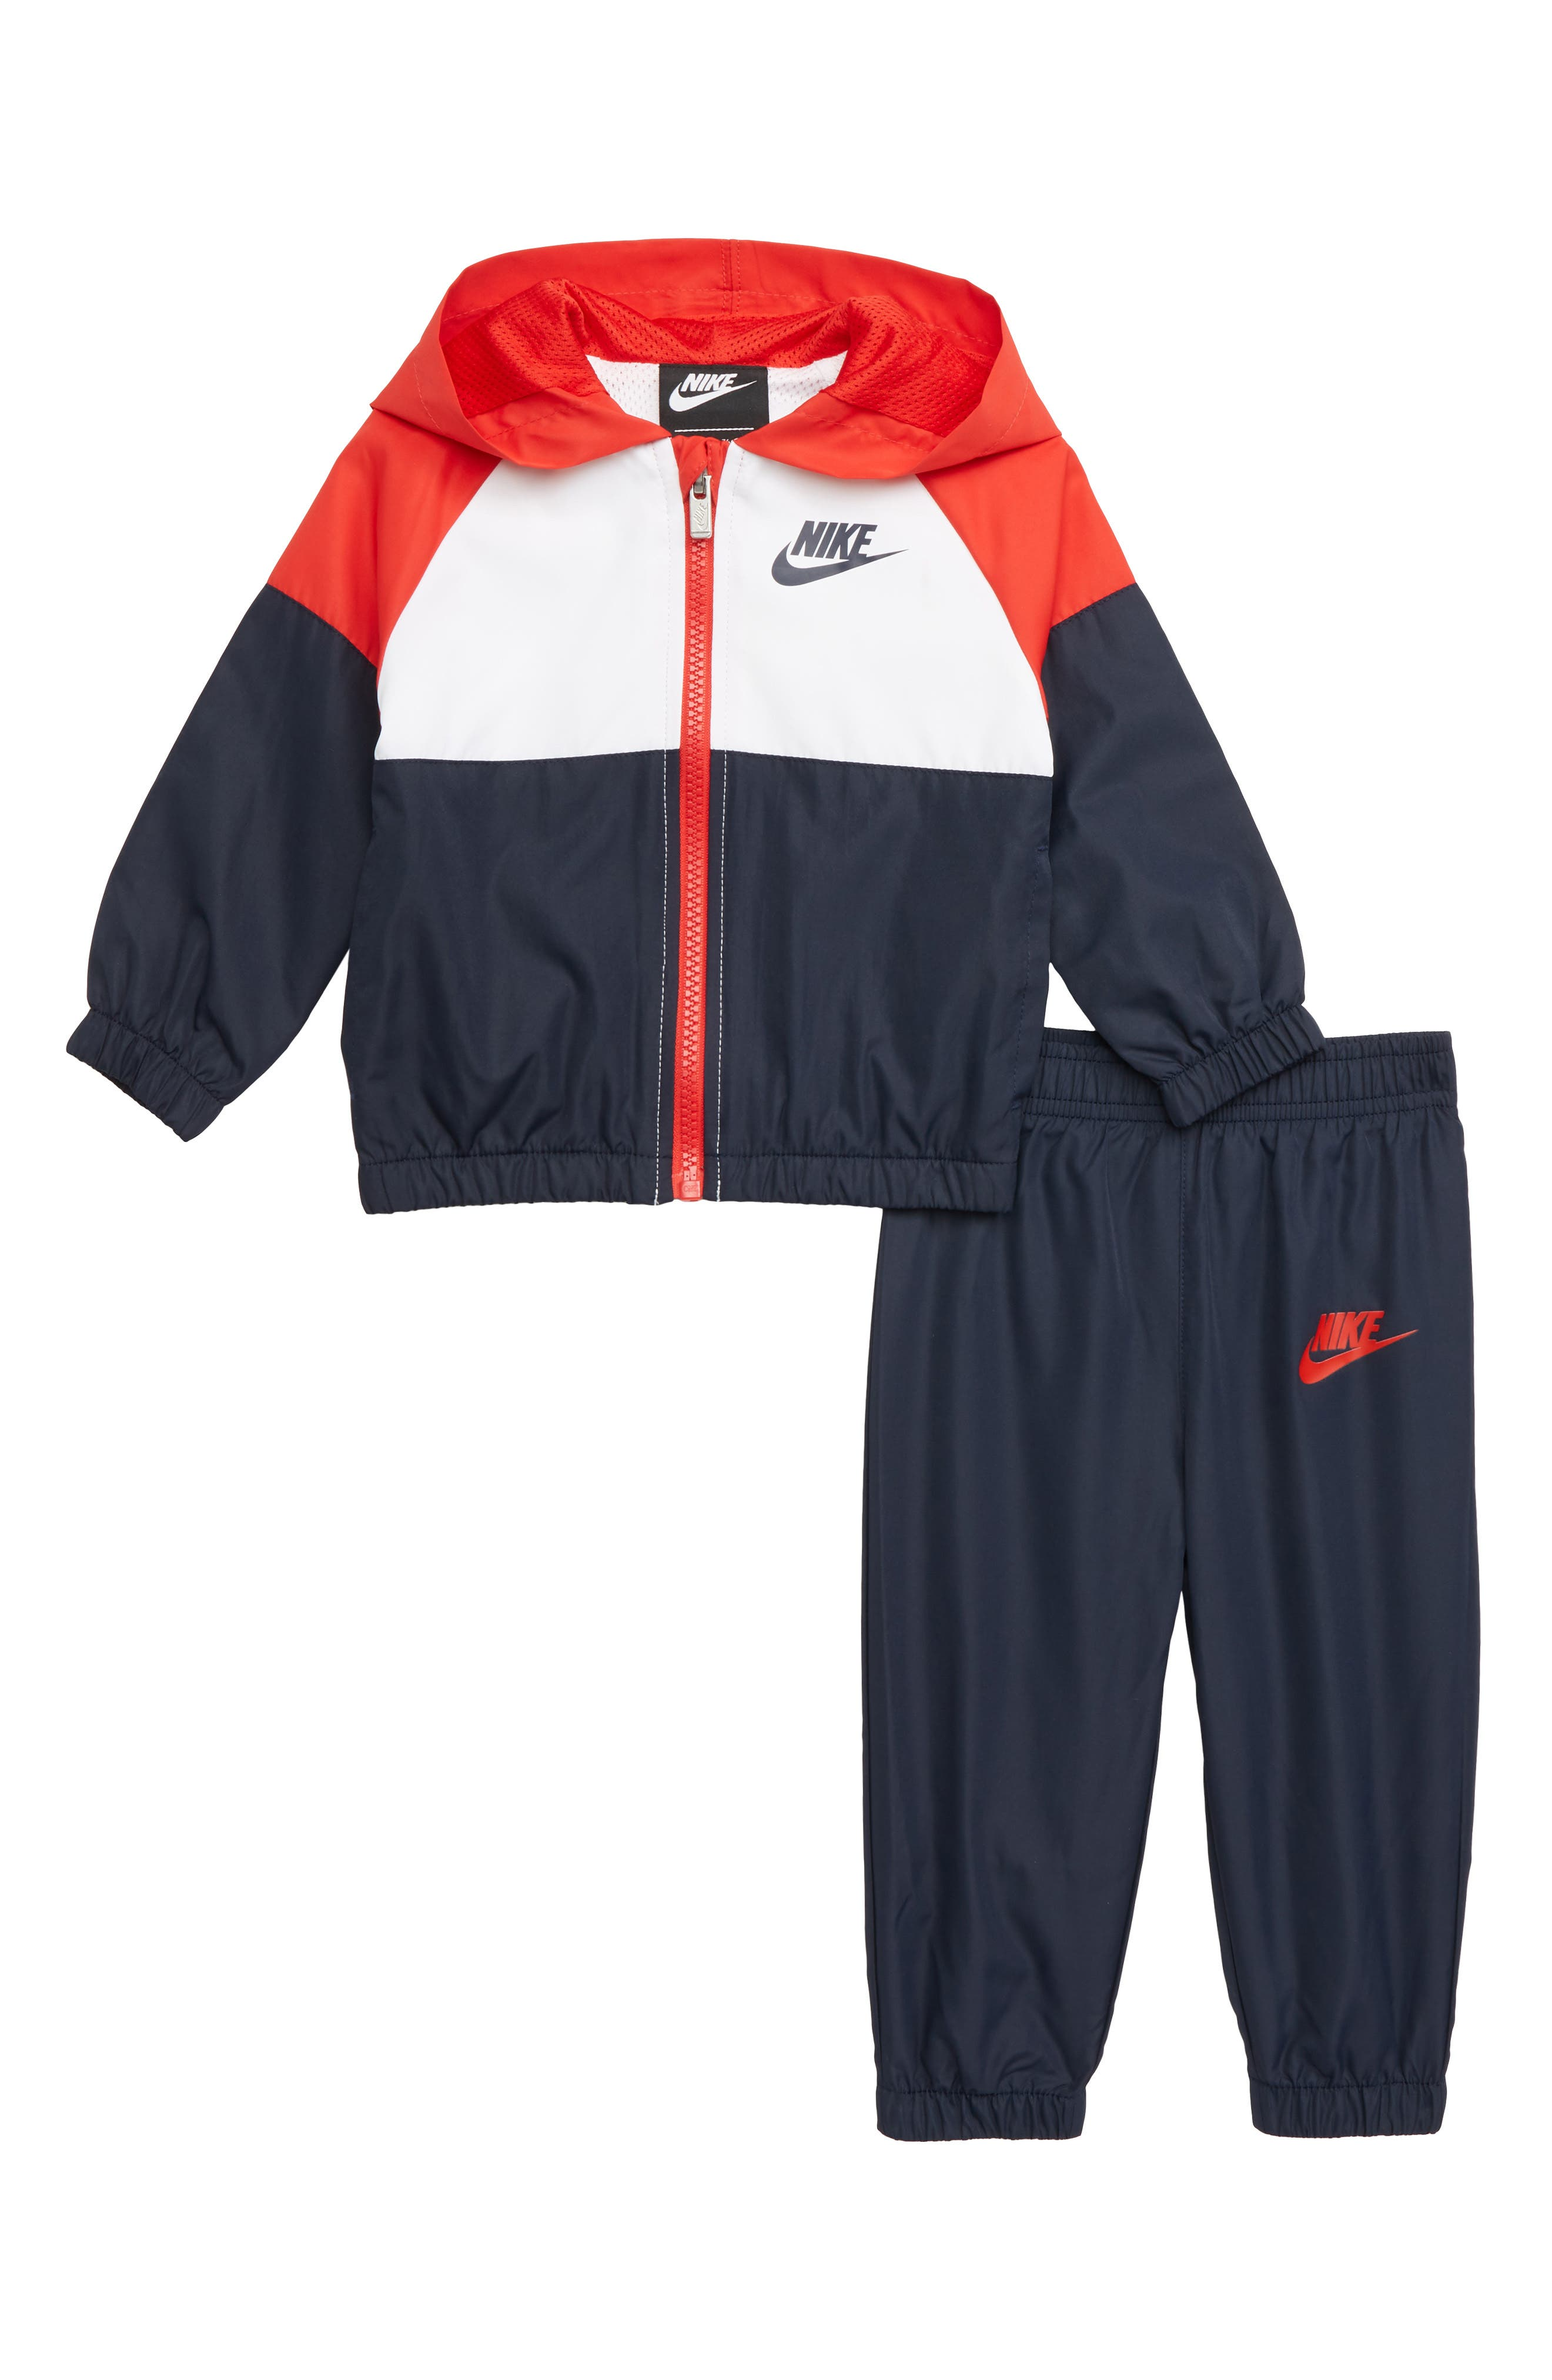 Infant Boys Nike Hooded Jacket  Track Pants Set